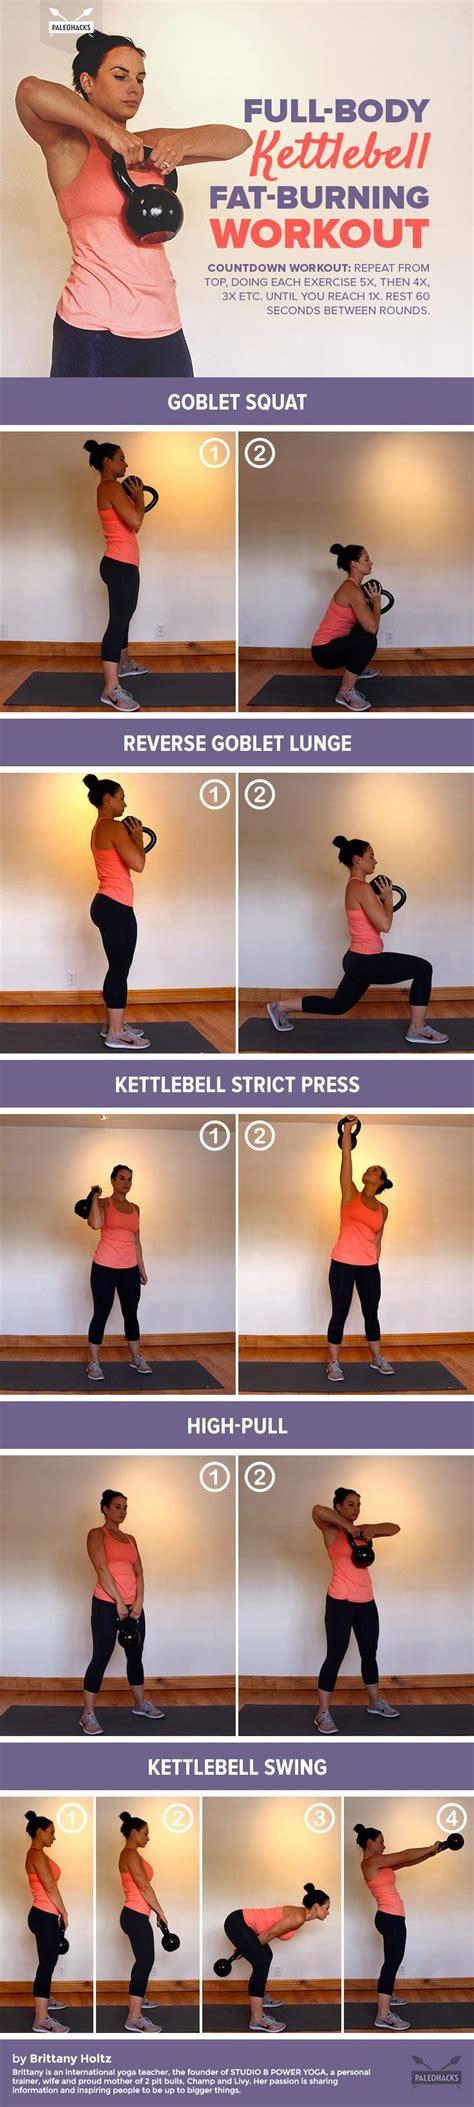 best kettlebell workout book 25 best ideas about kettle bell workouts on